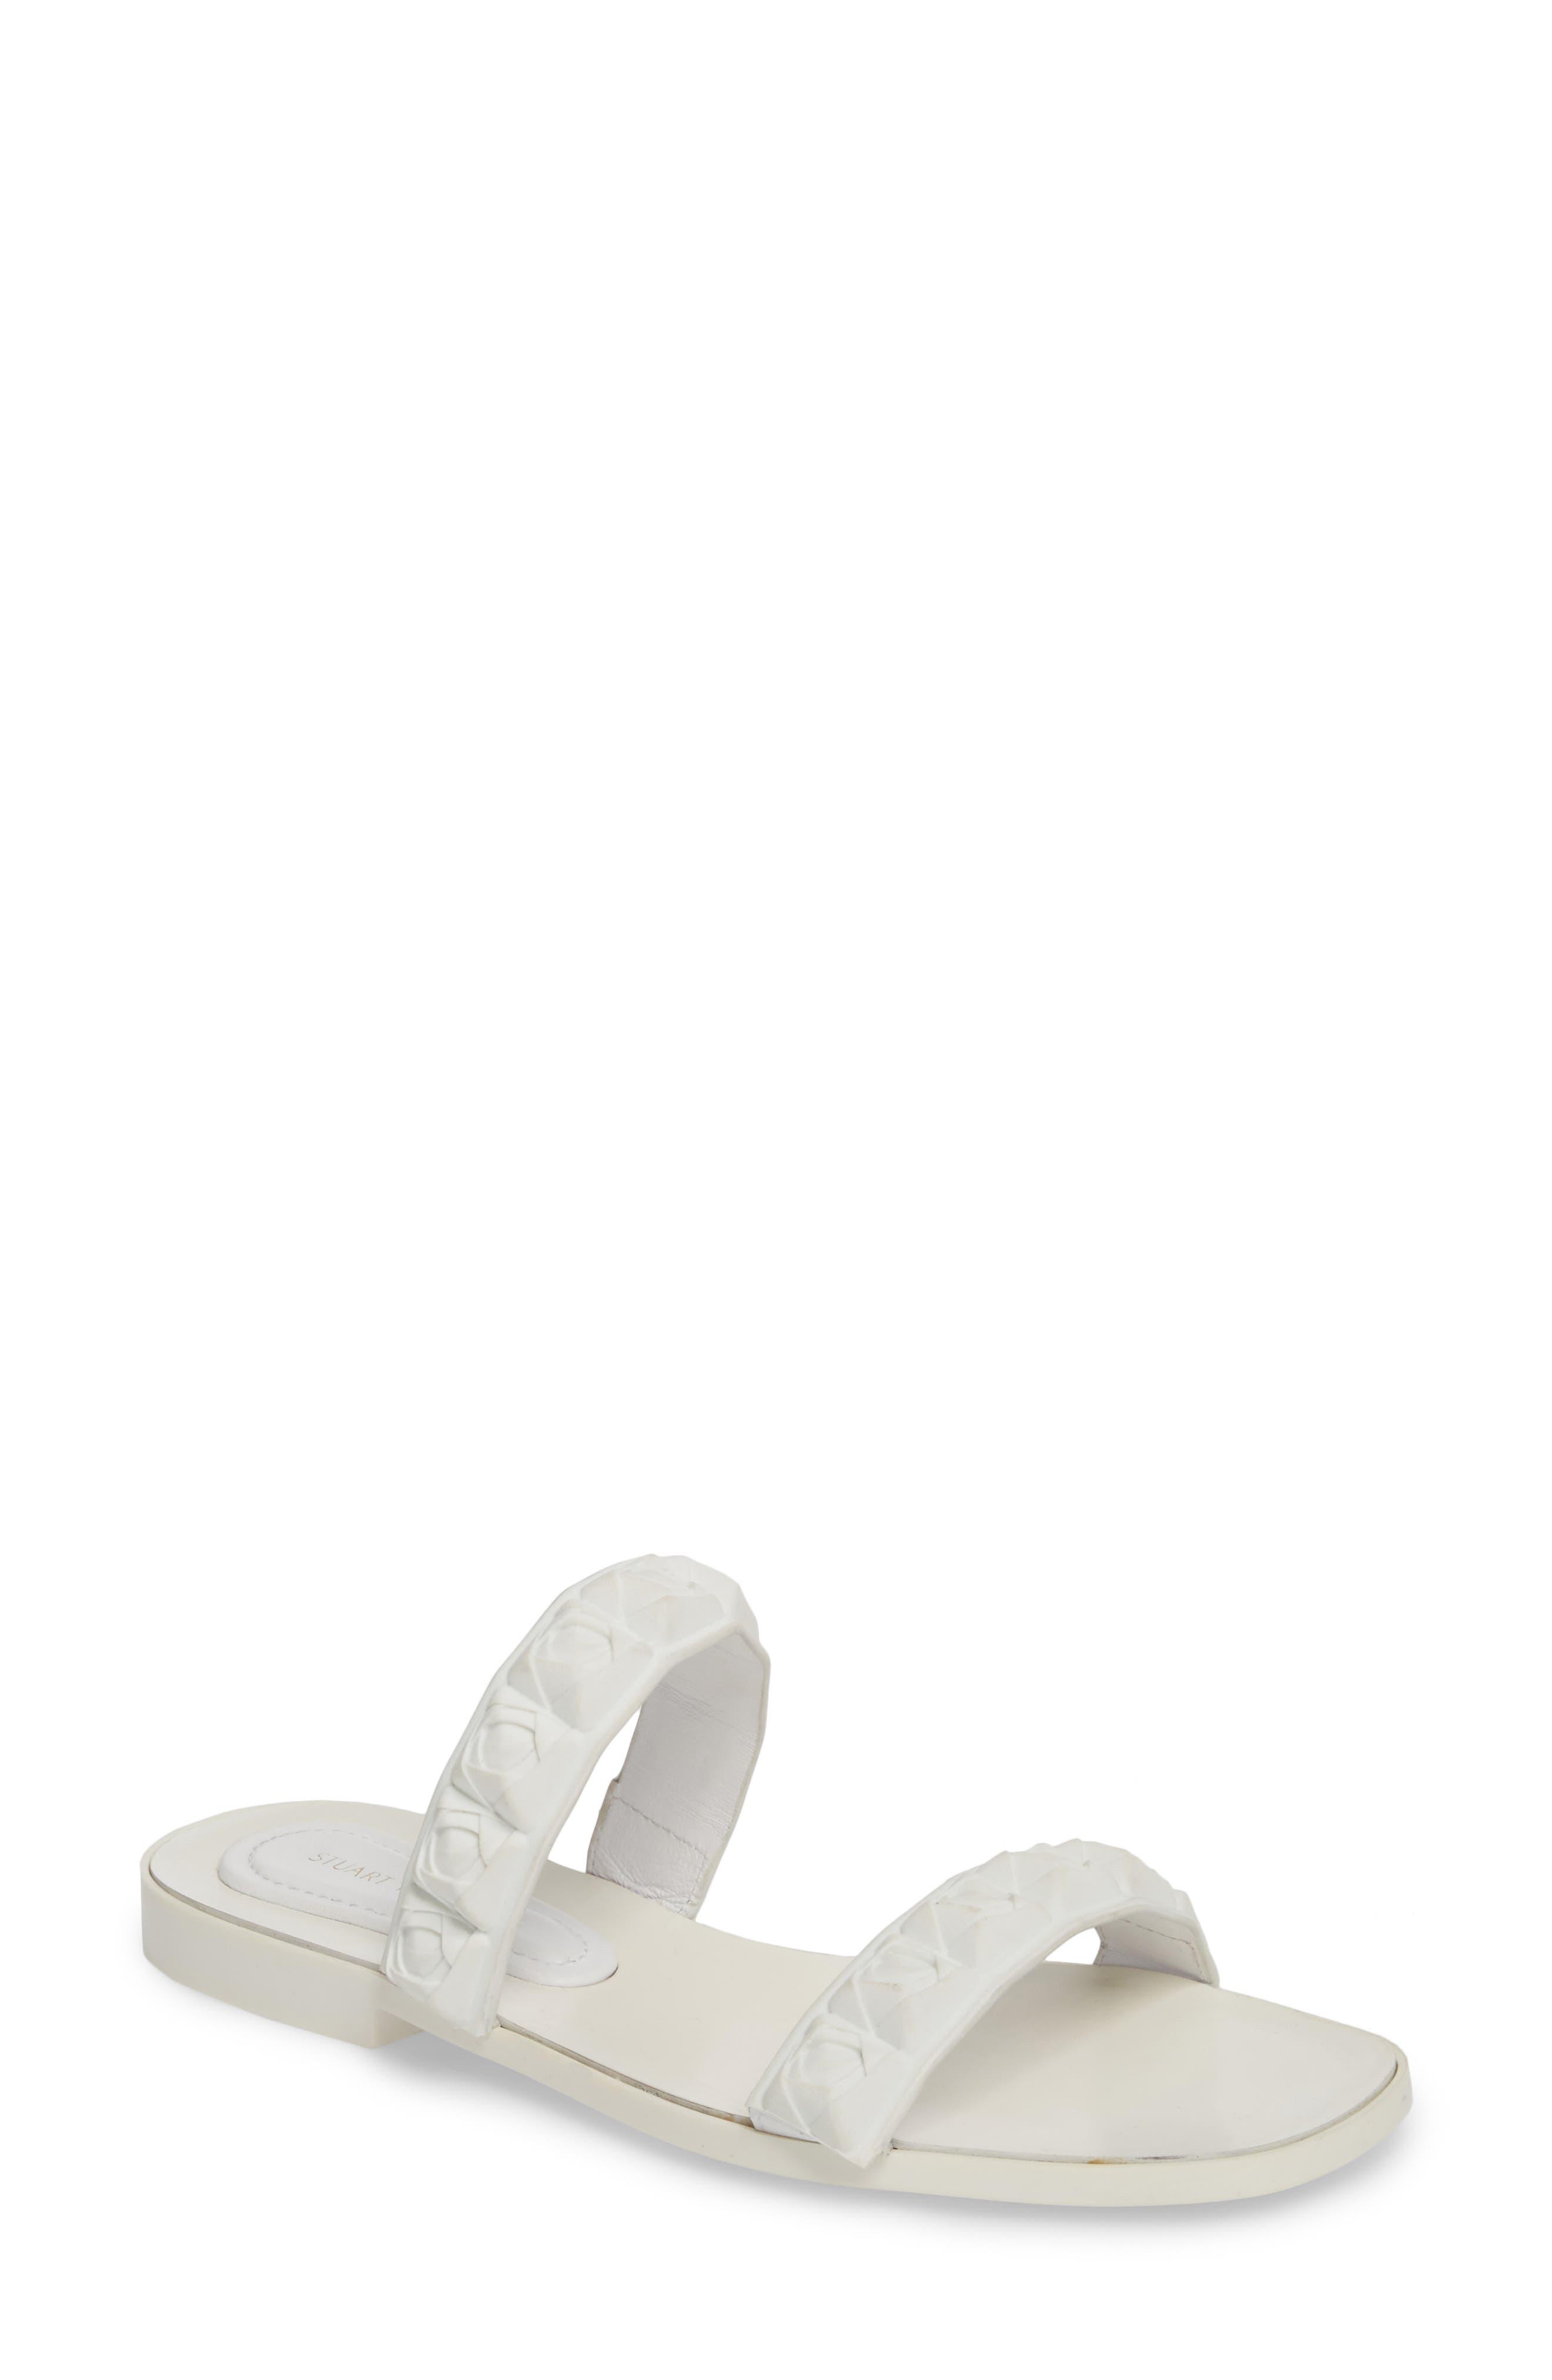 Rosita Dual Strap Slide Sandal,                             Main thumbnail 2, color,